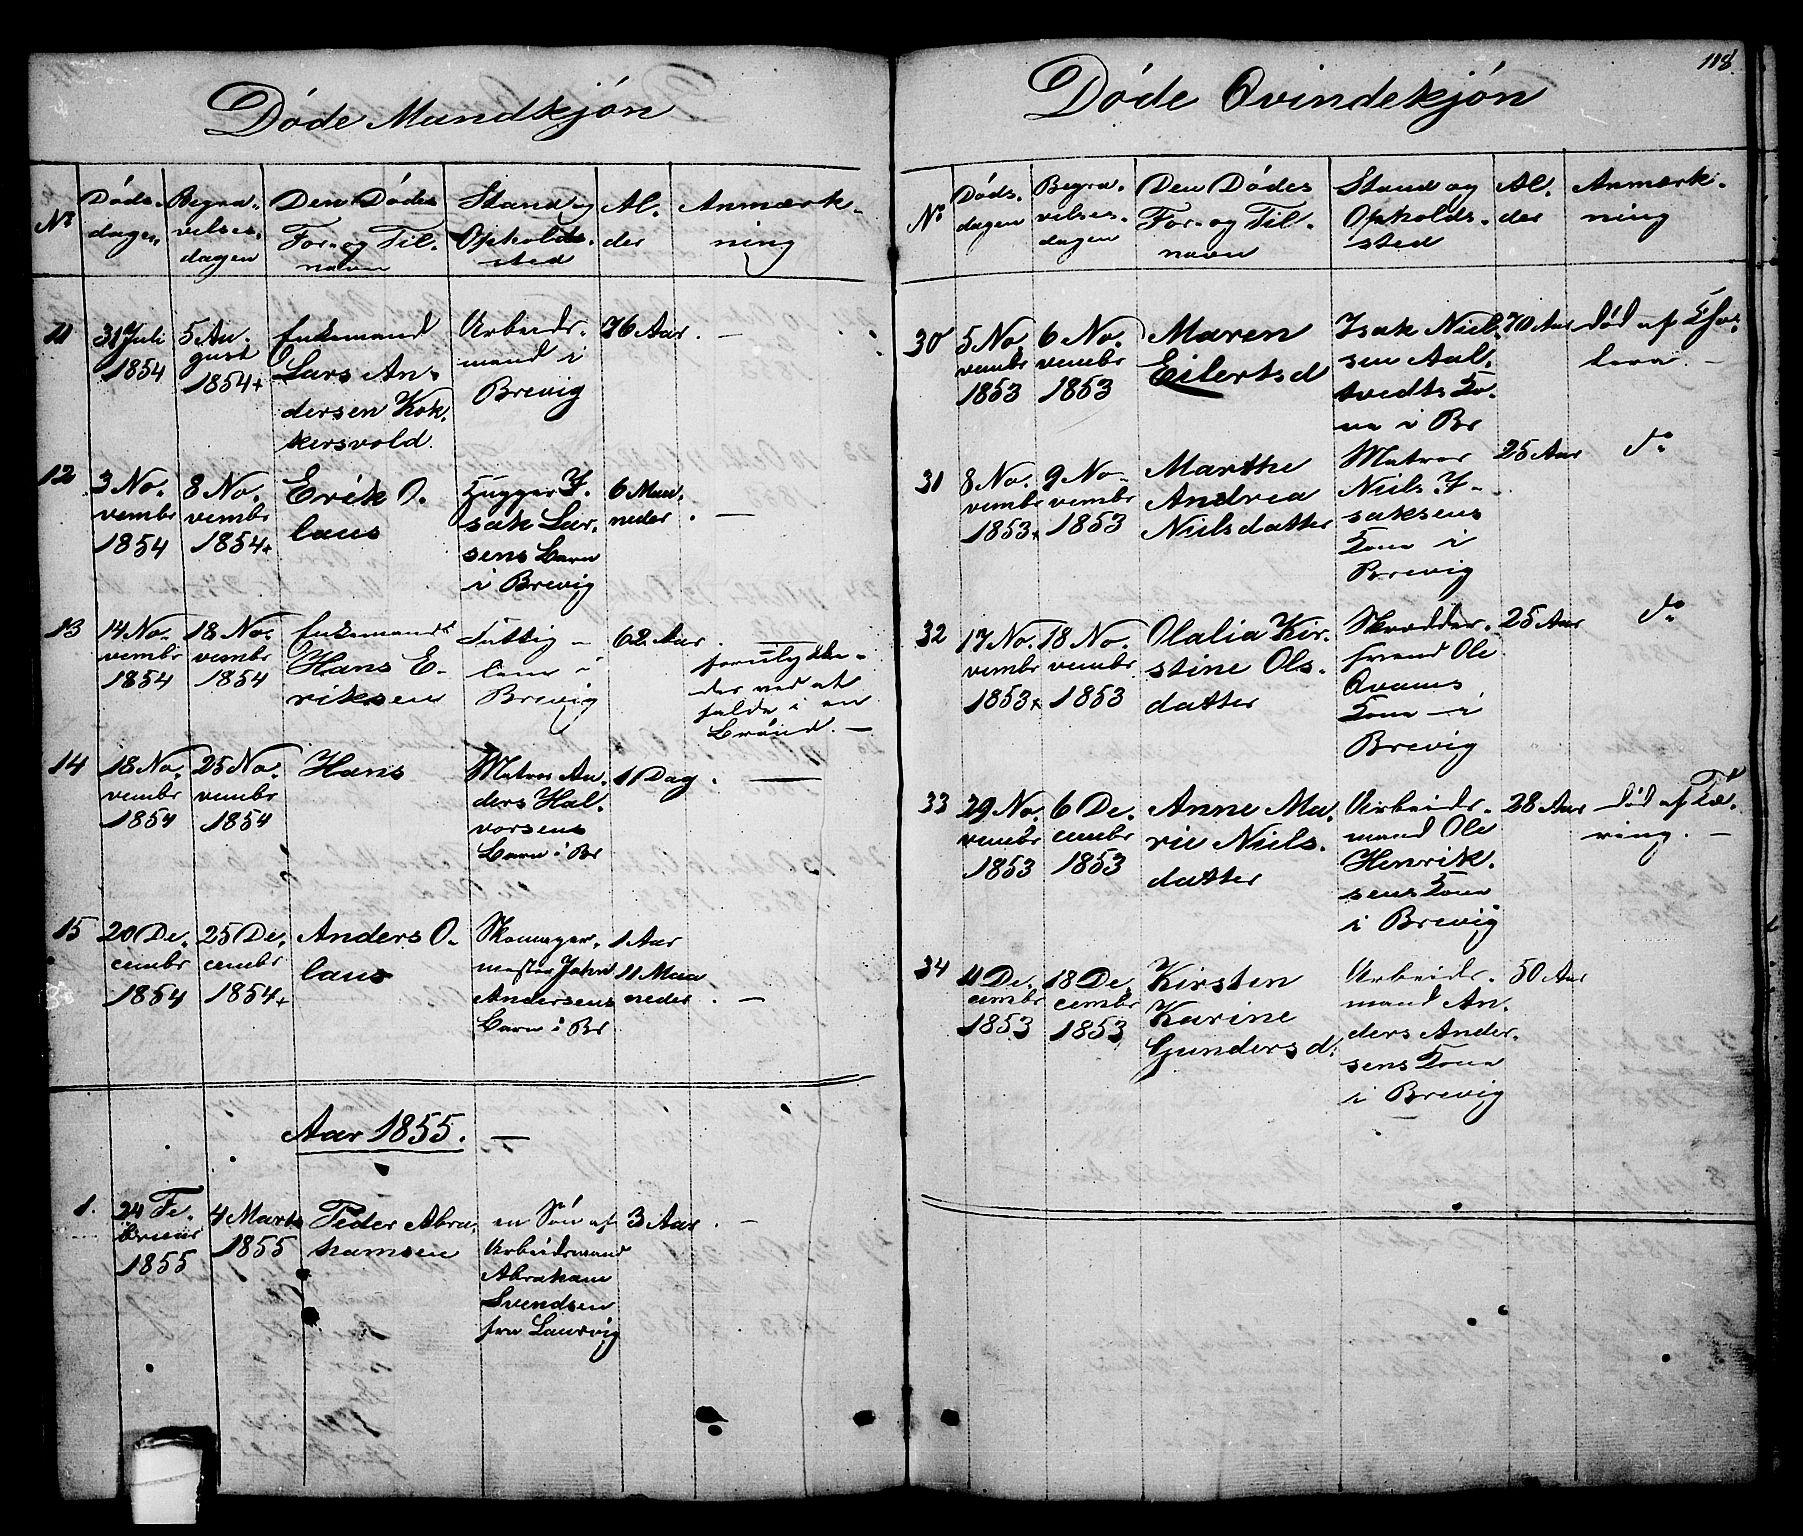 SAKO, Brevik kirkebøker, G/Ga/L0002: Klokkerbok nr. 2, 1846-1865, s. 118